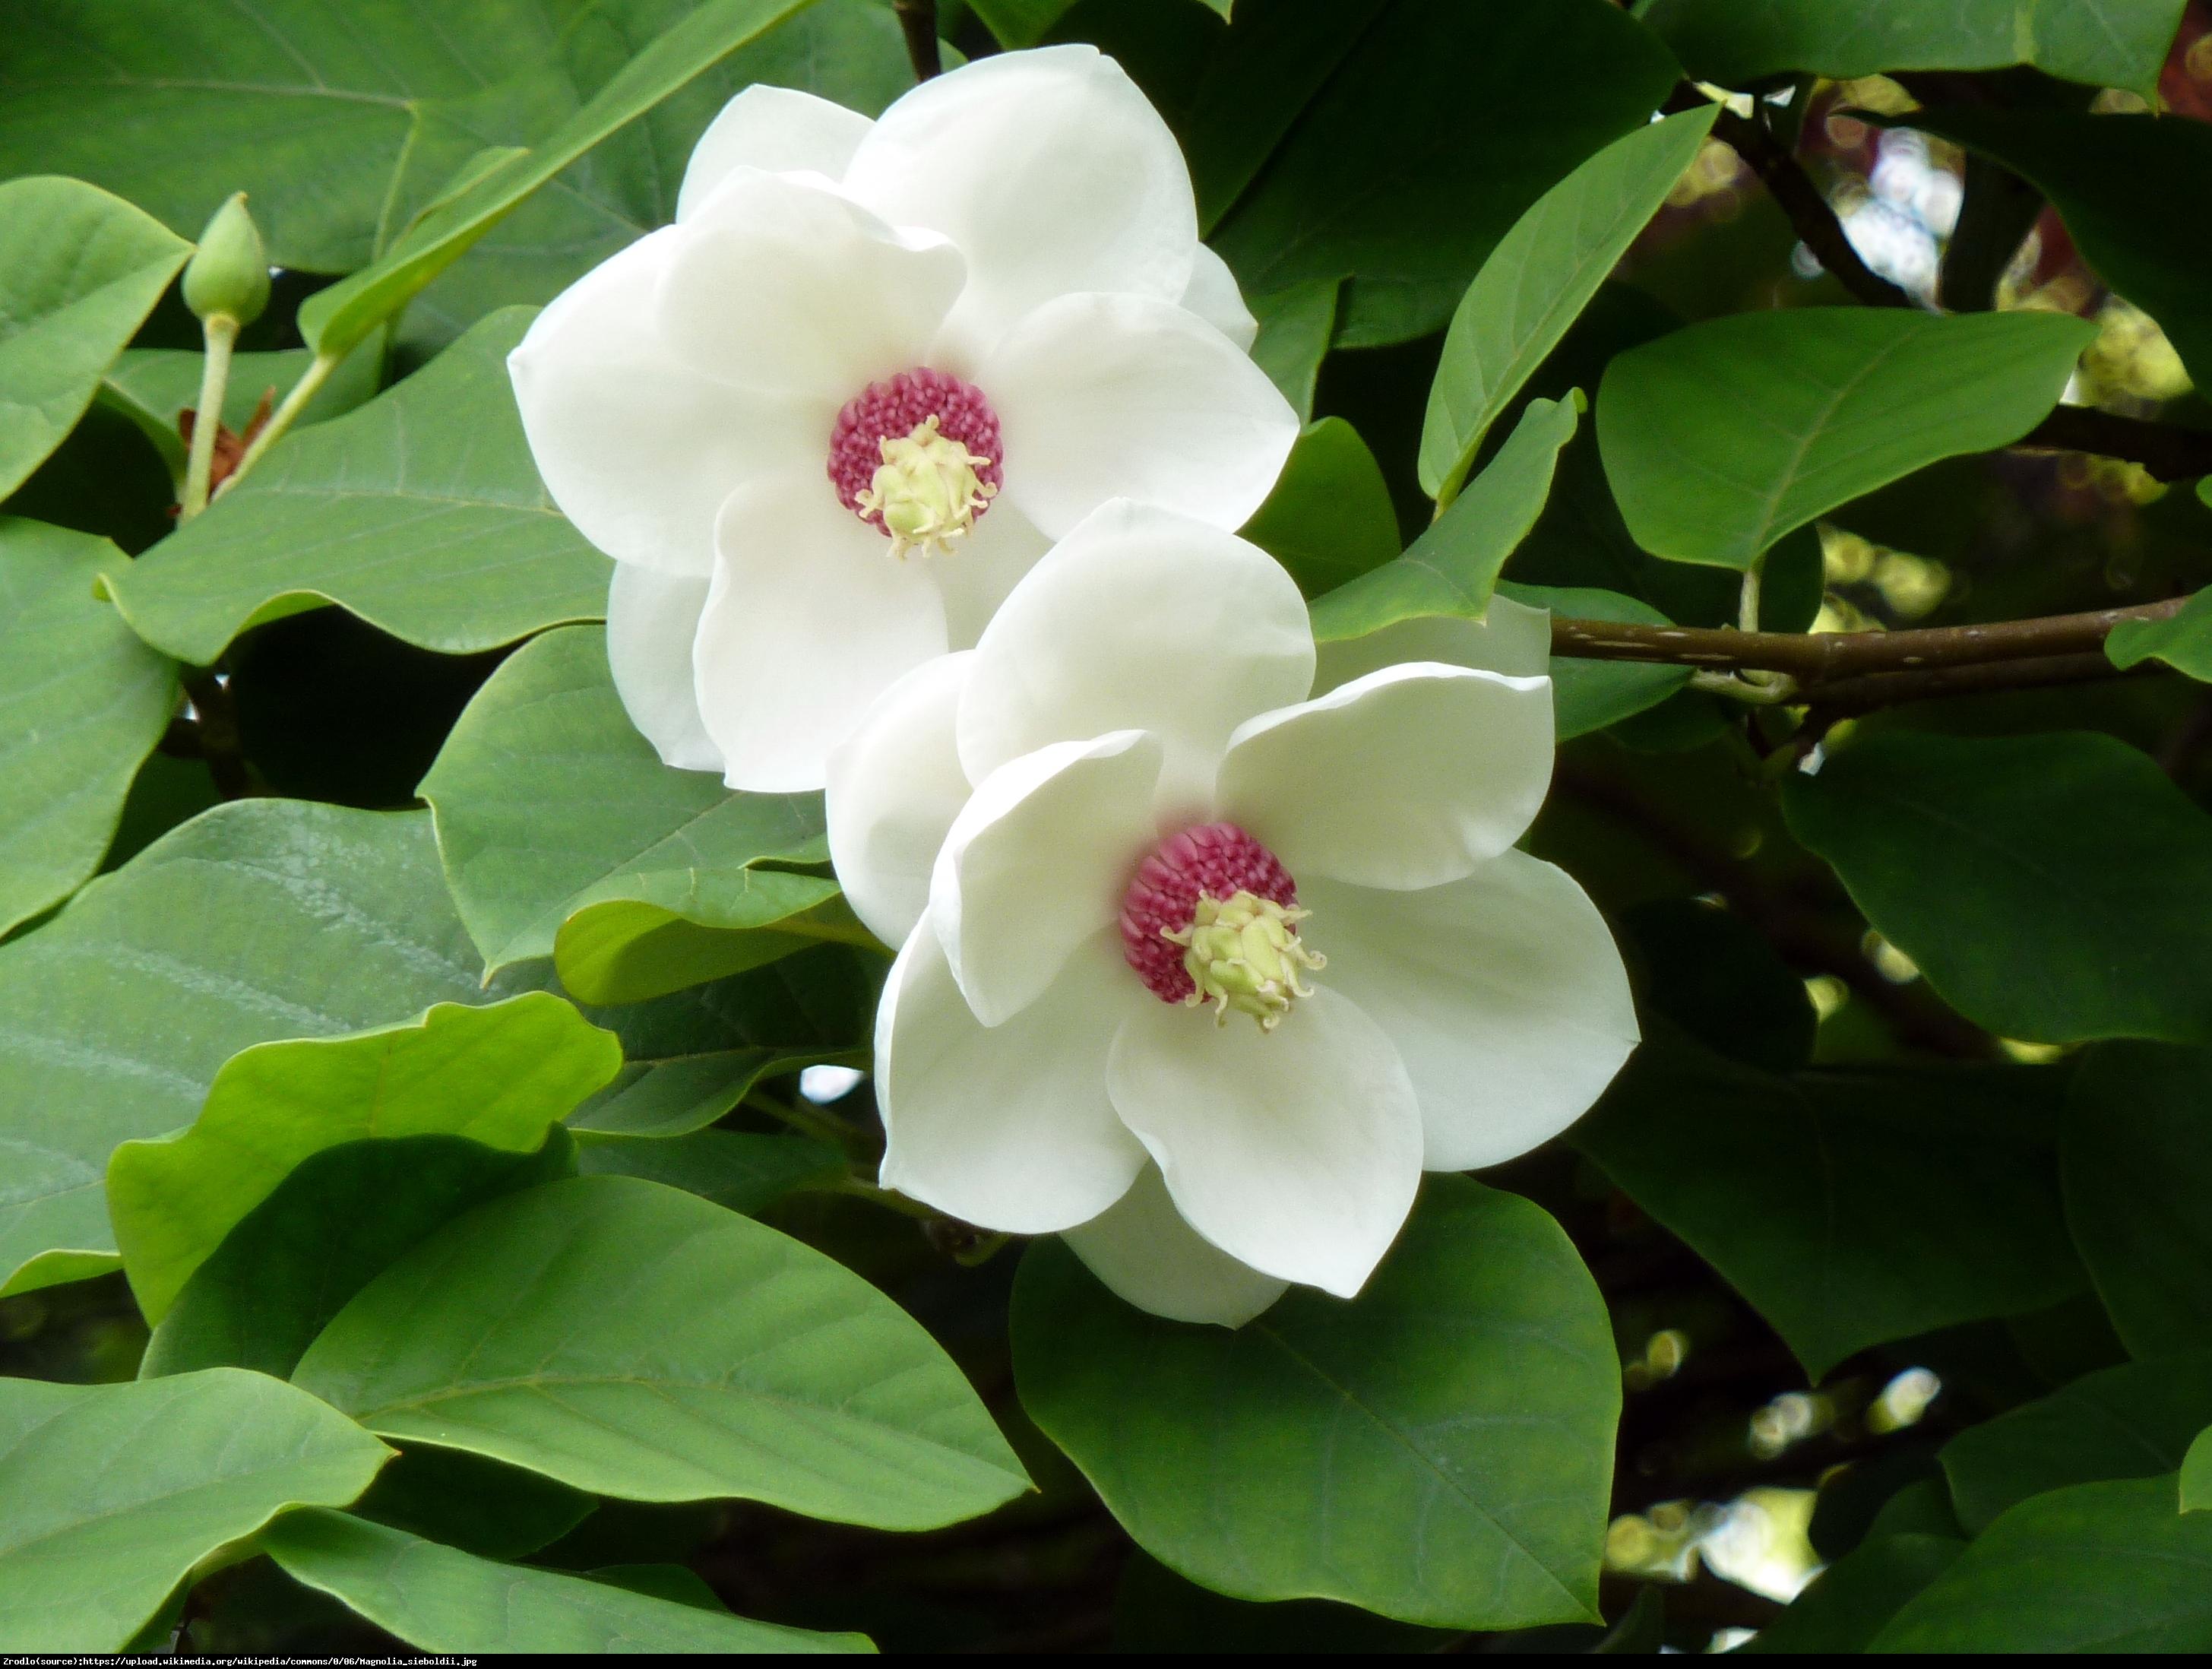 Magnolia Siebolda P9 - Magnolia sieboldi